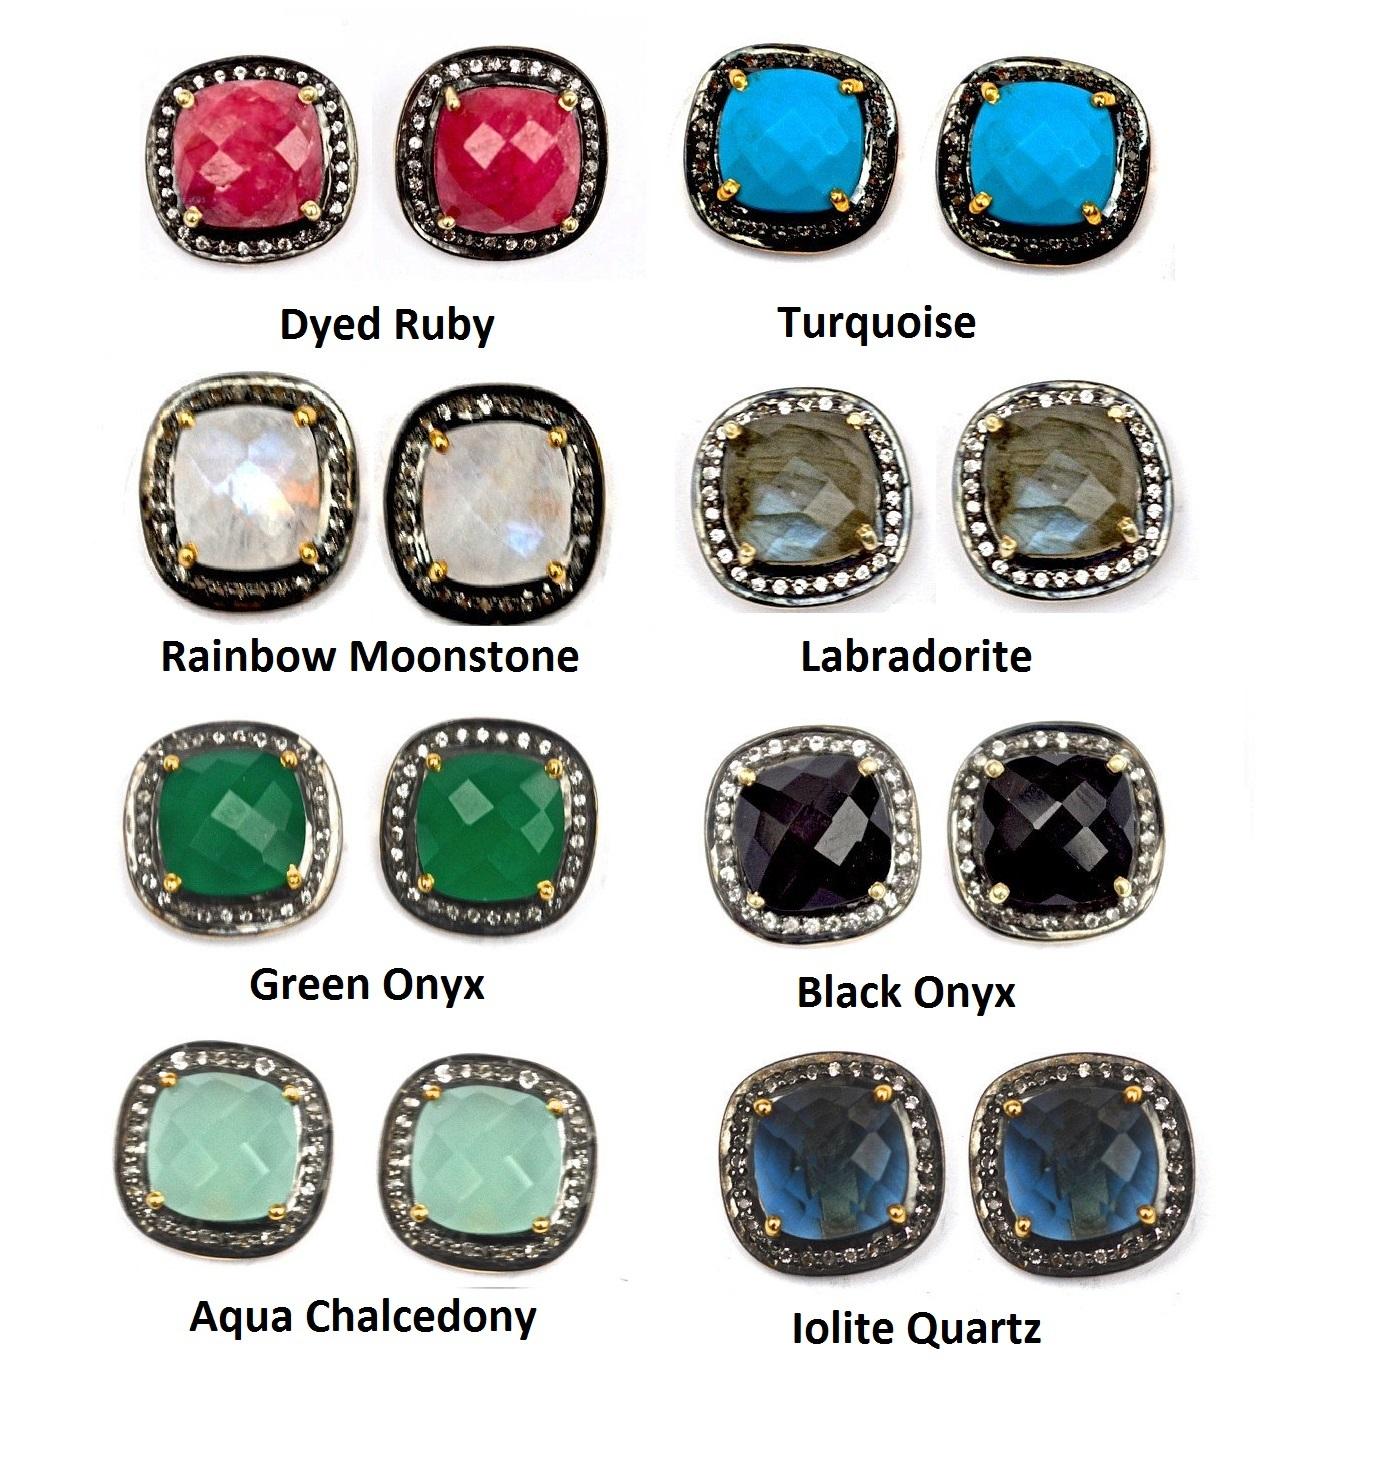 Pave Diamond Set Dyed Ruby Cushion Shape Gemstone Stud Earrings